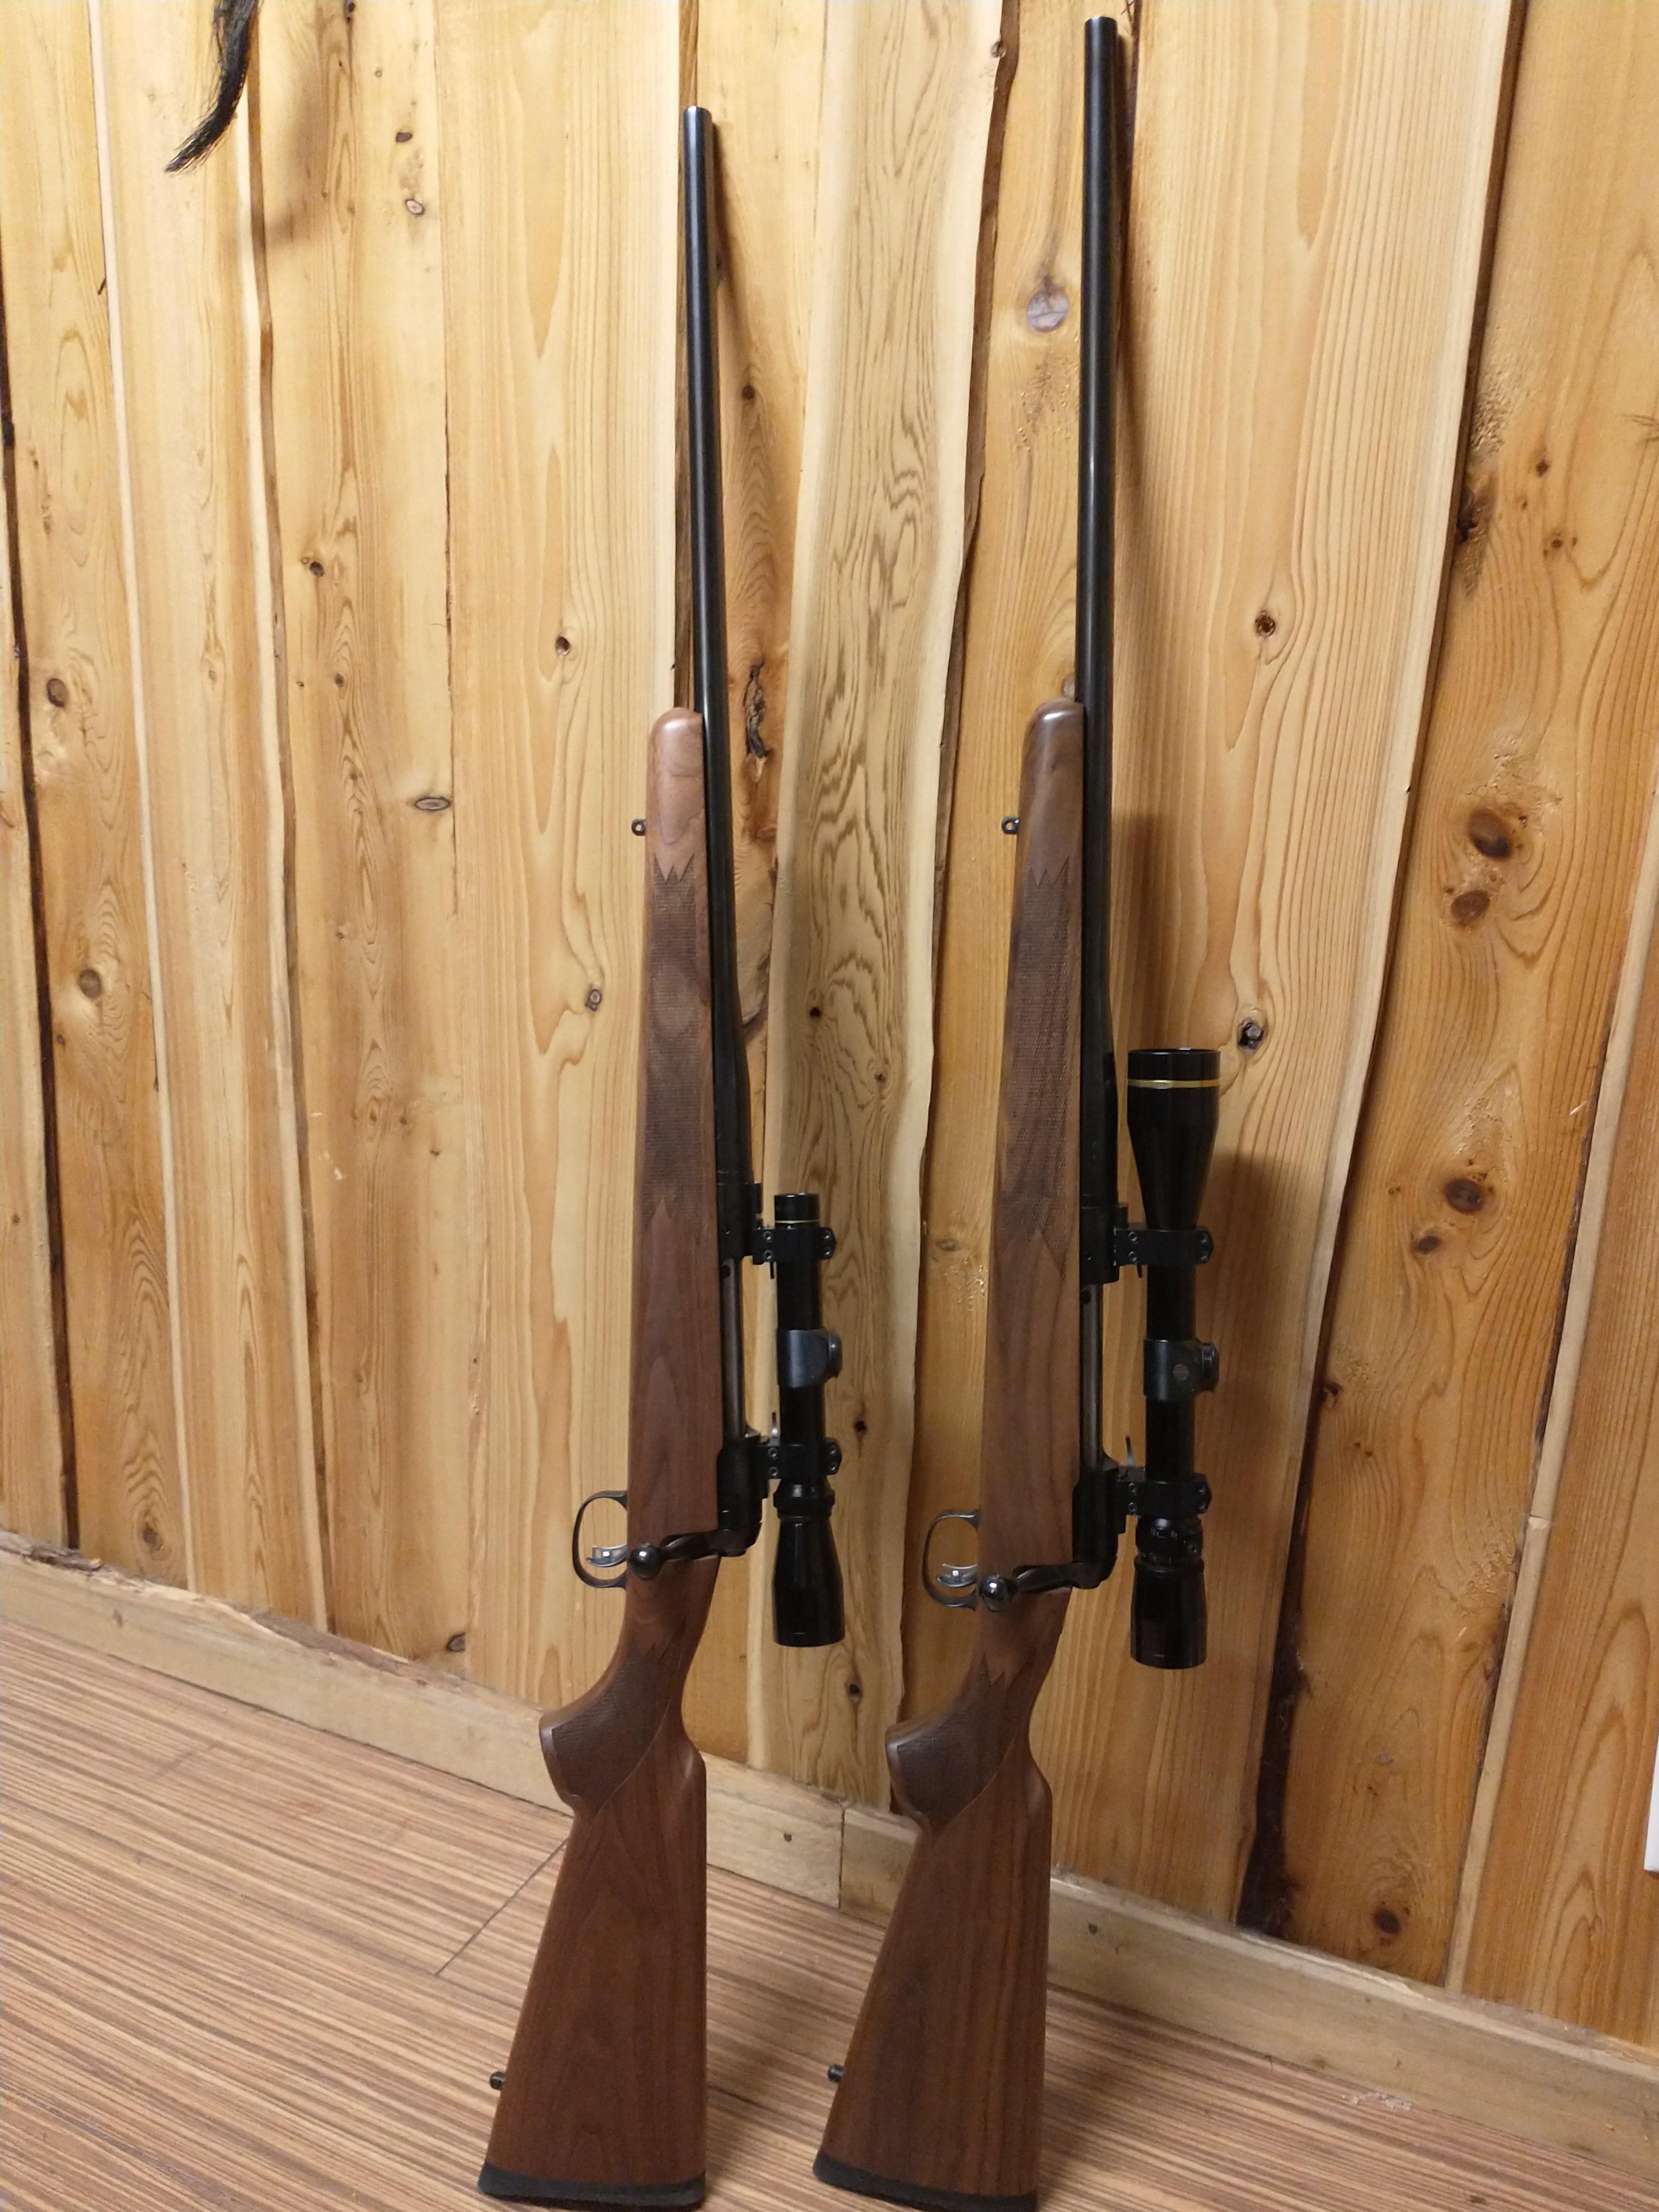 rifles1.jpg